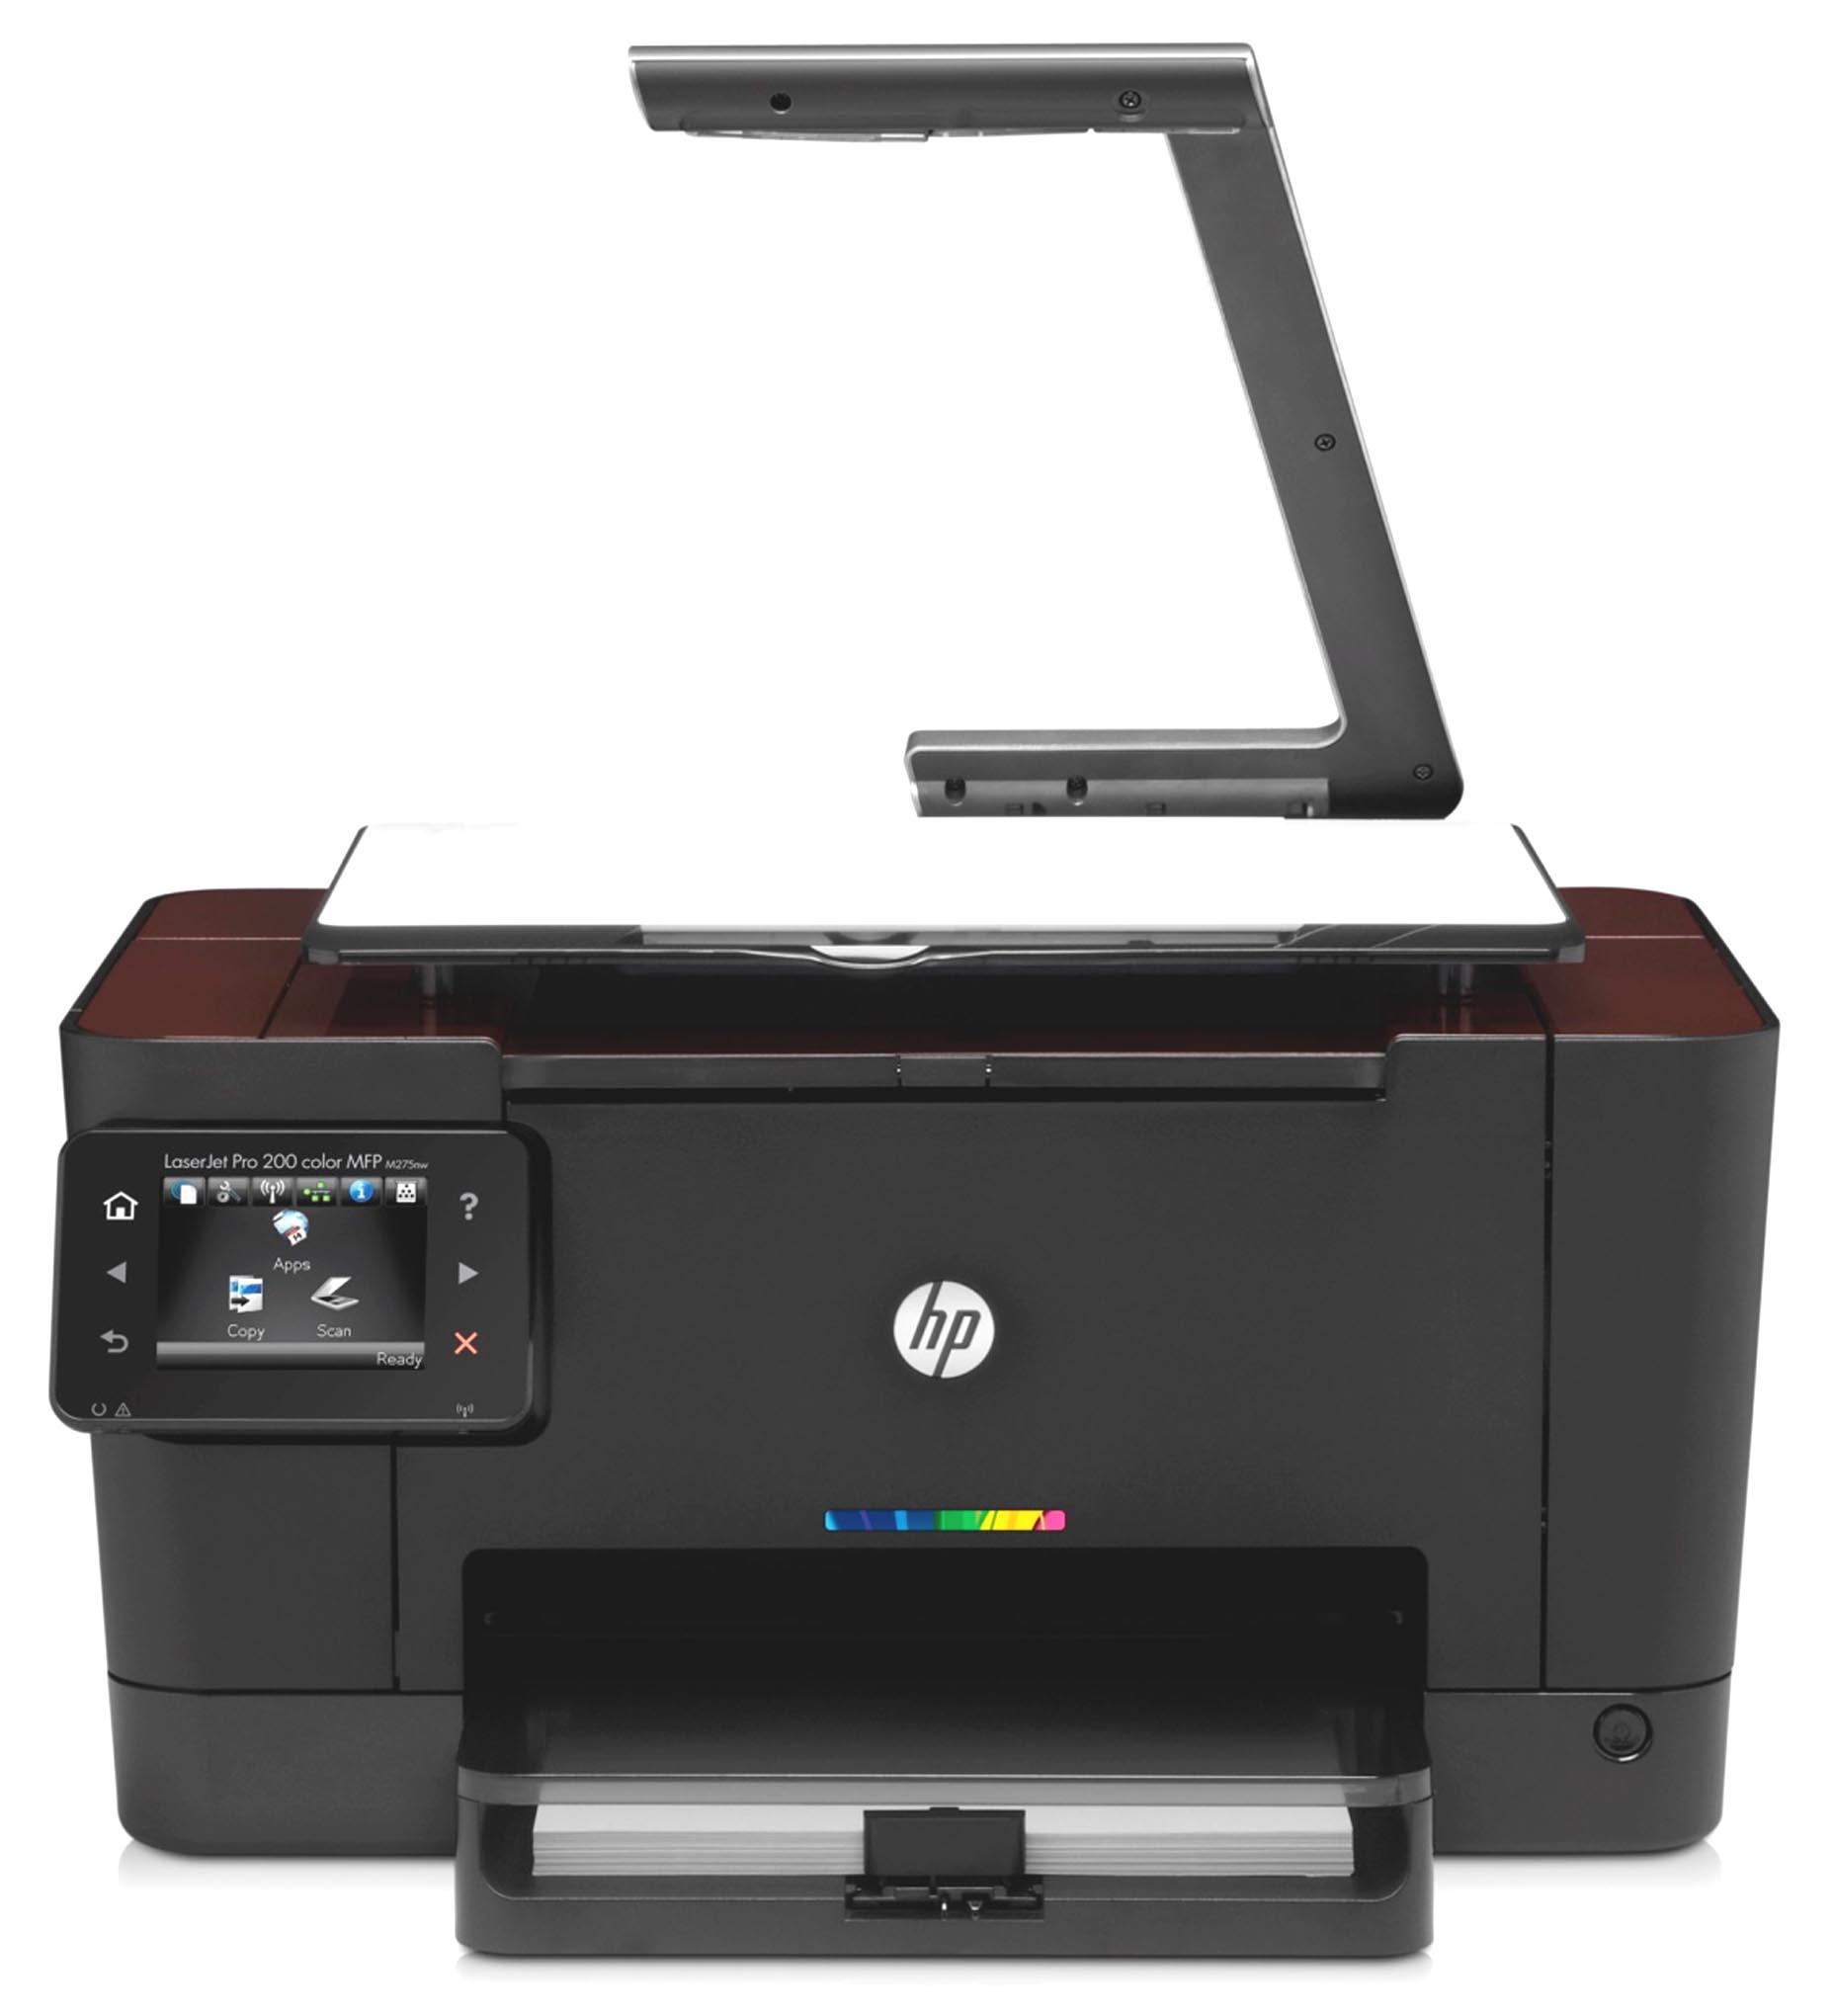 Thread: Harga HP TopShot LaserJet Pro M275 MFP CF040A Printer